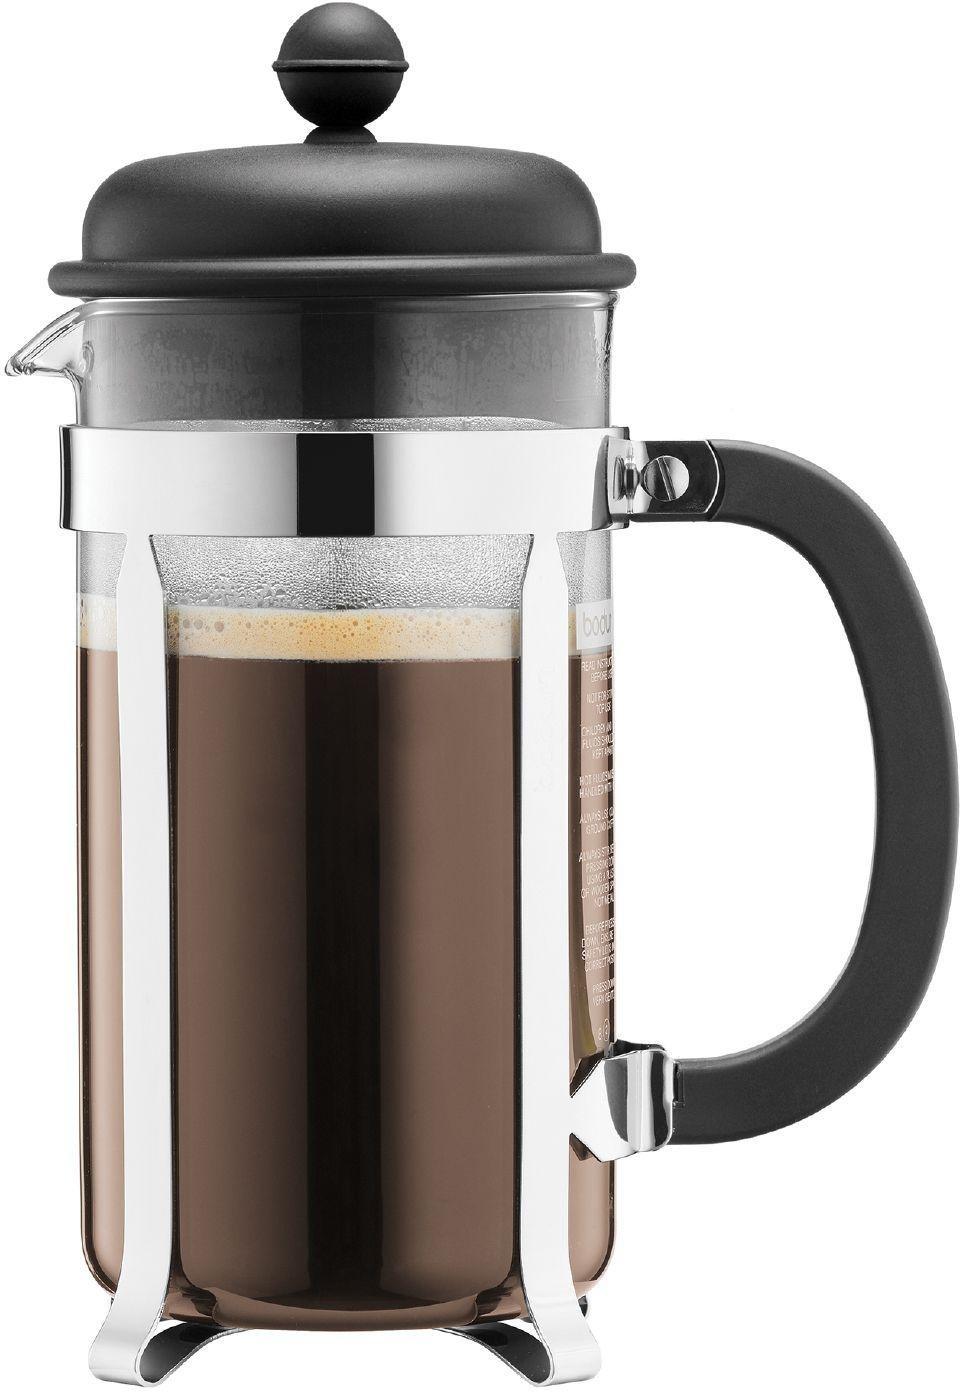 Image of Bodum - Caffettiera Coffee Maker 8 Cup - Black